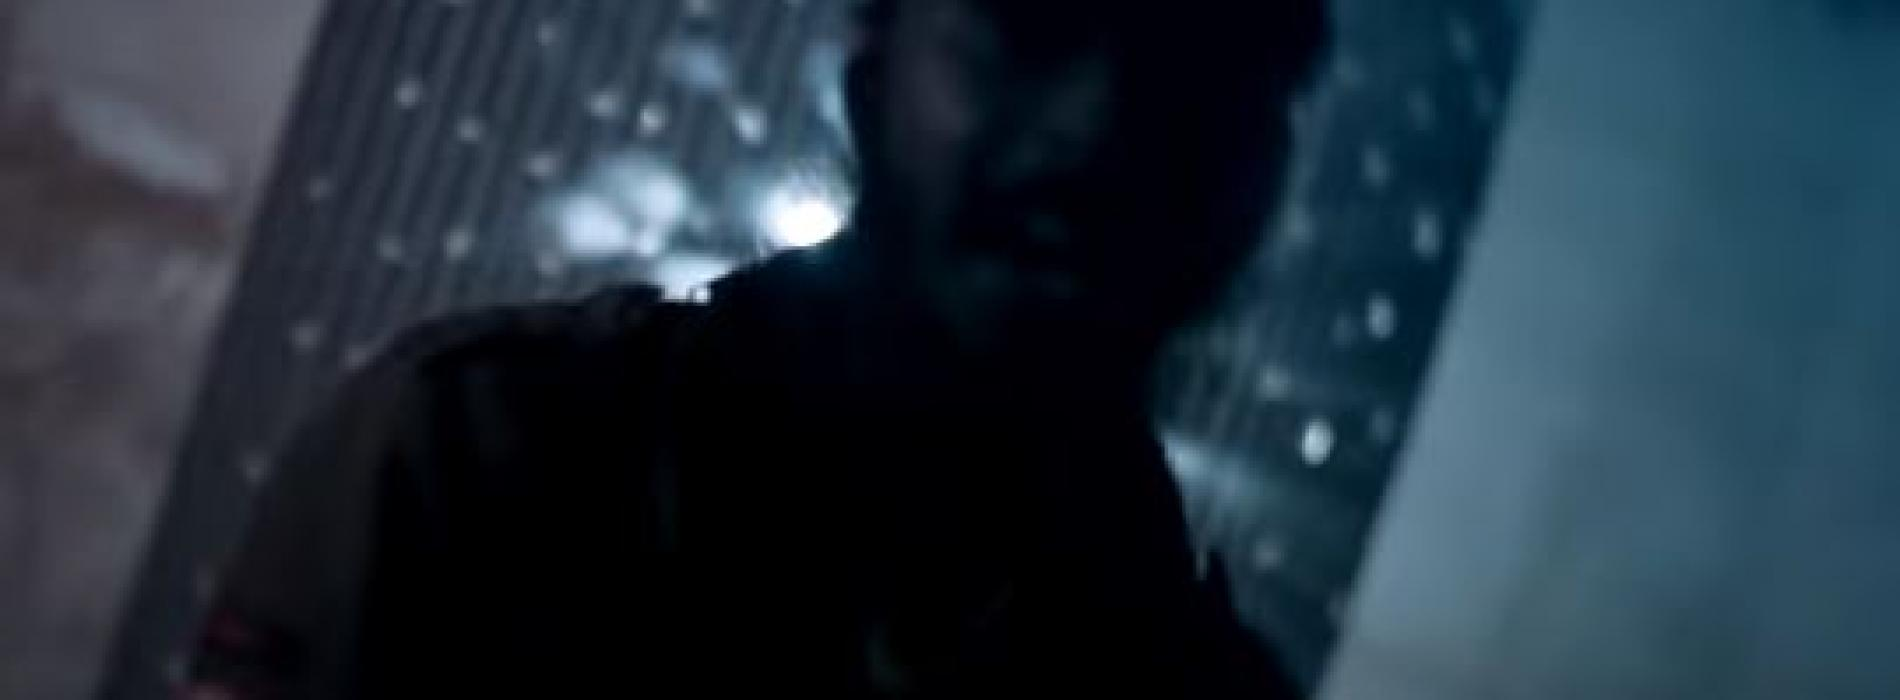 New Music : MasterD – Ma Ekka Hitin (මා එක්ක හිටින්) Official Music Video